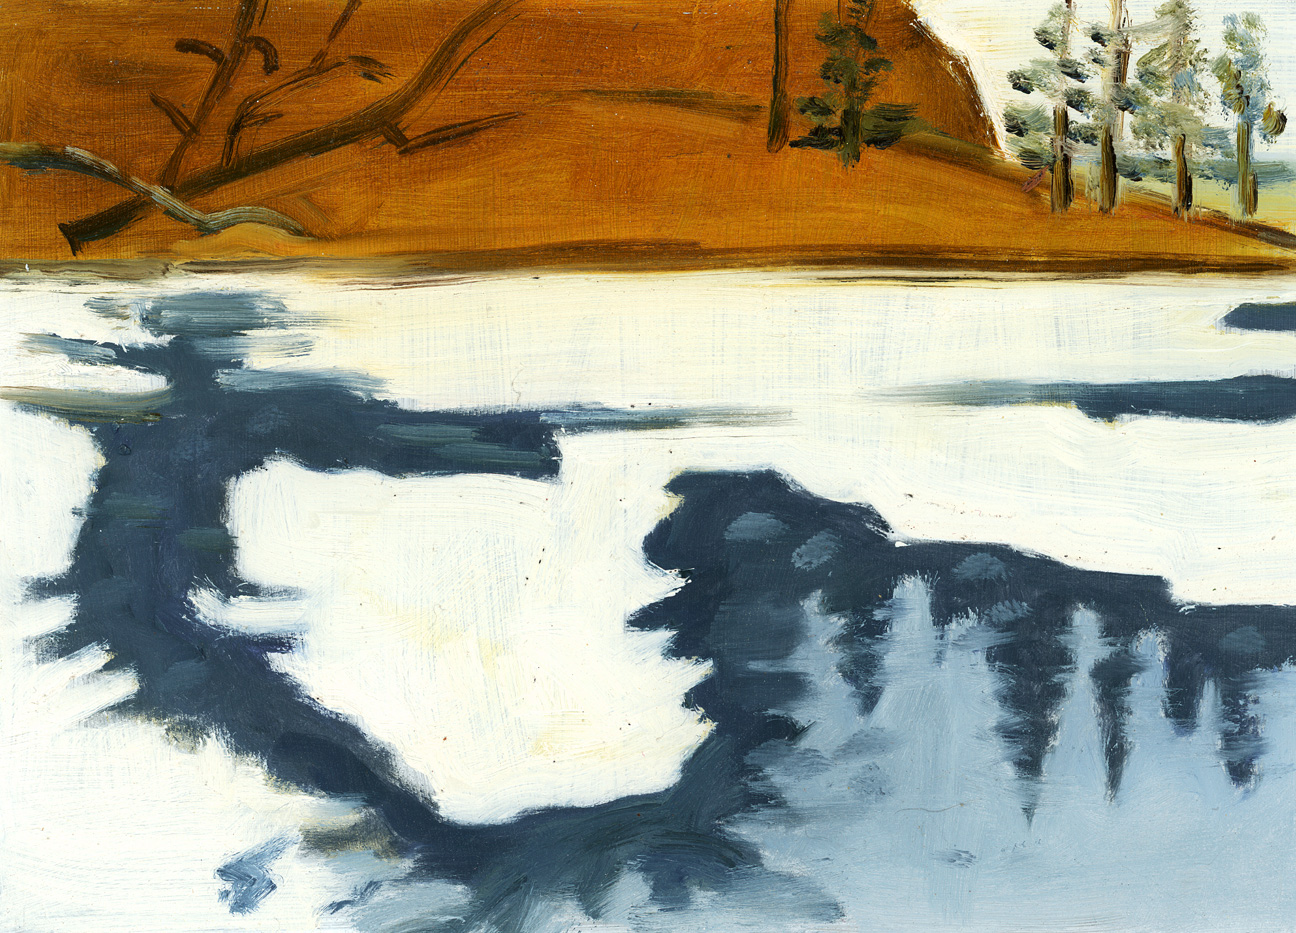 Copy of Feb 23, 1985 (Blair Pond Frozen)